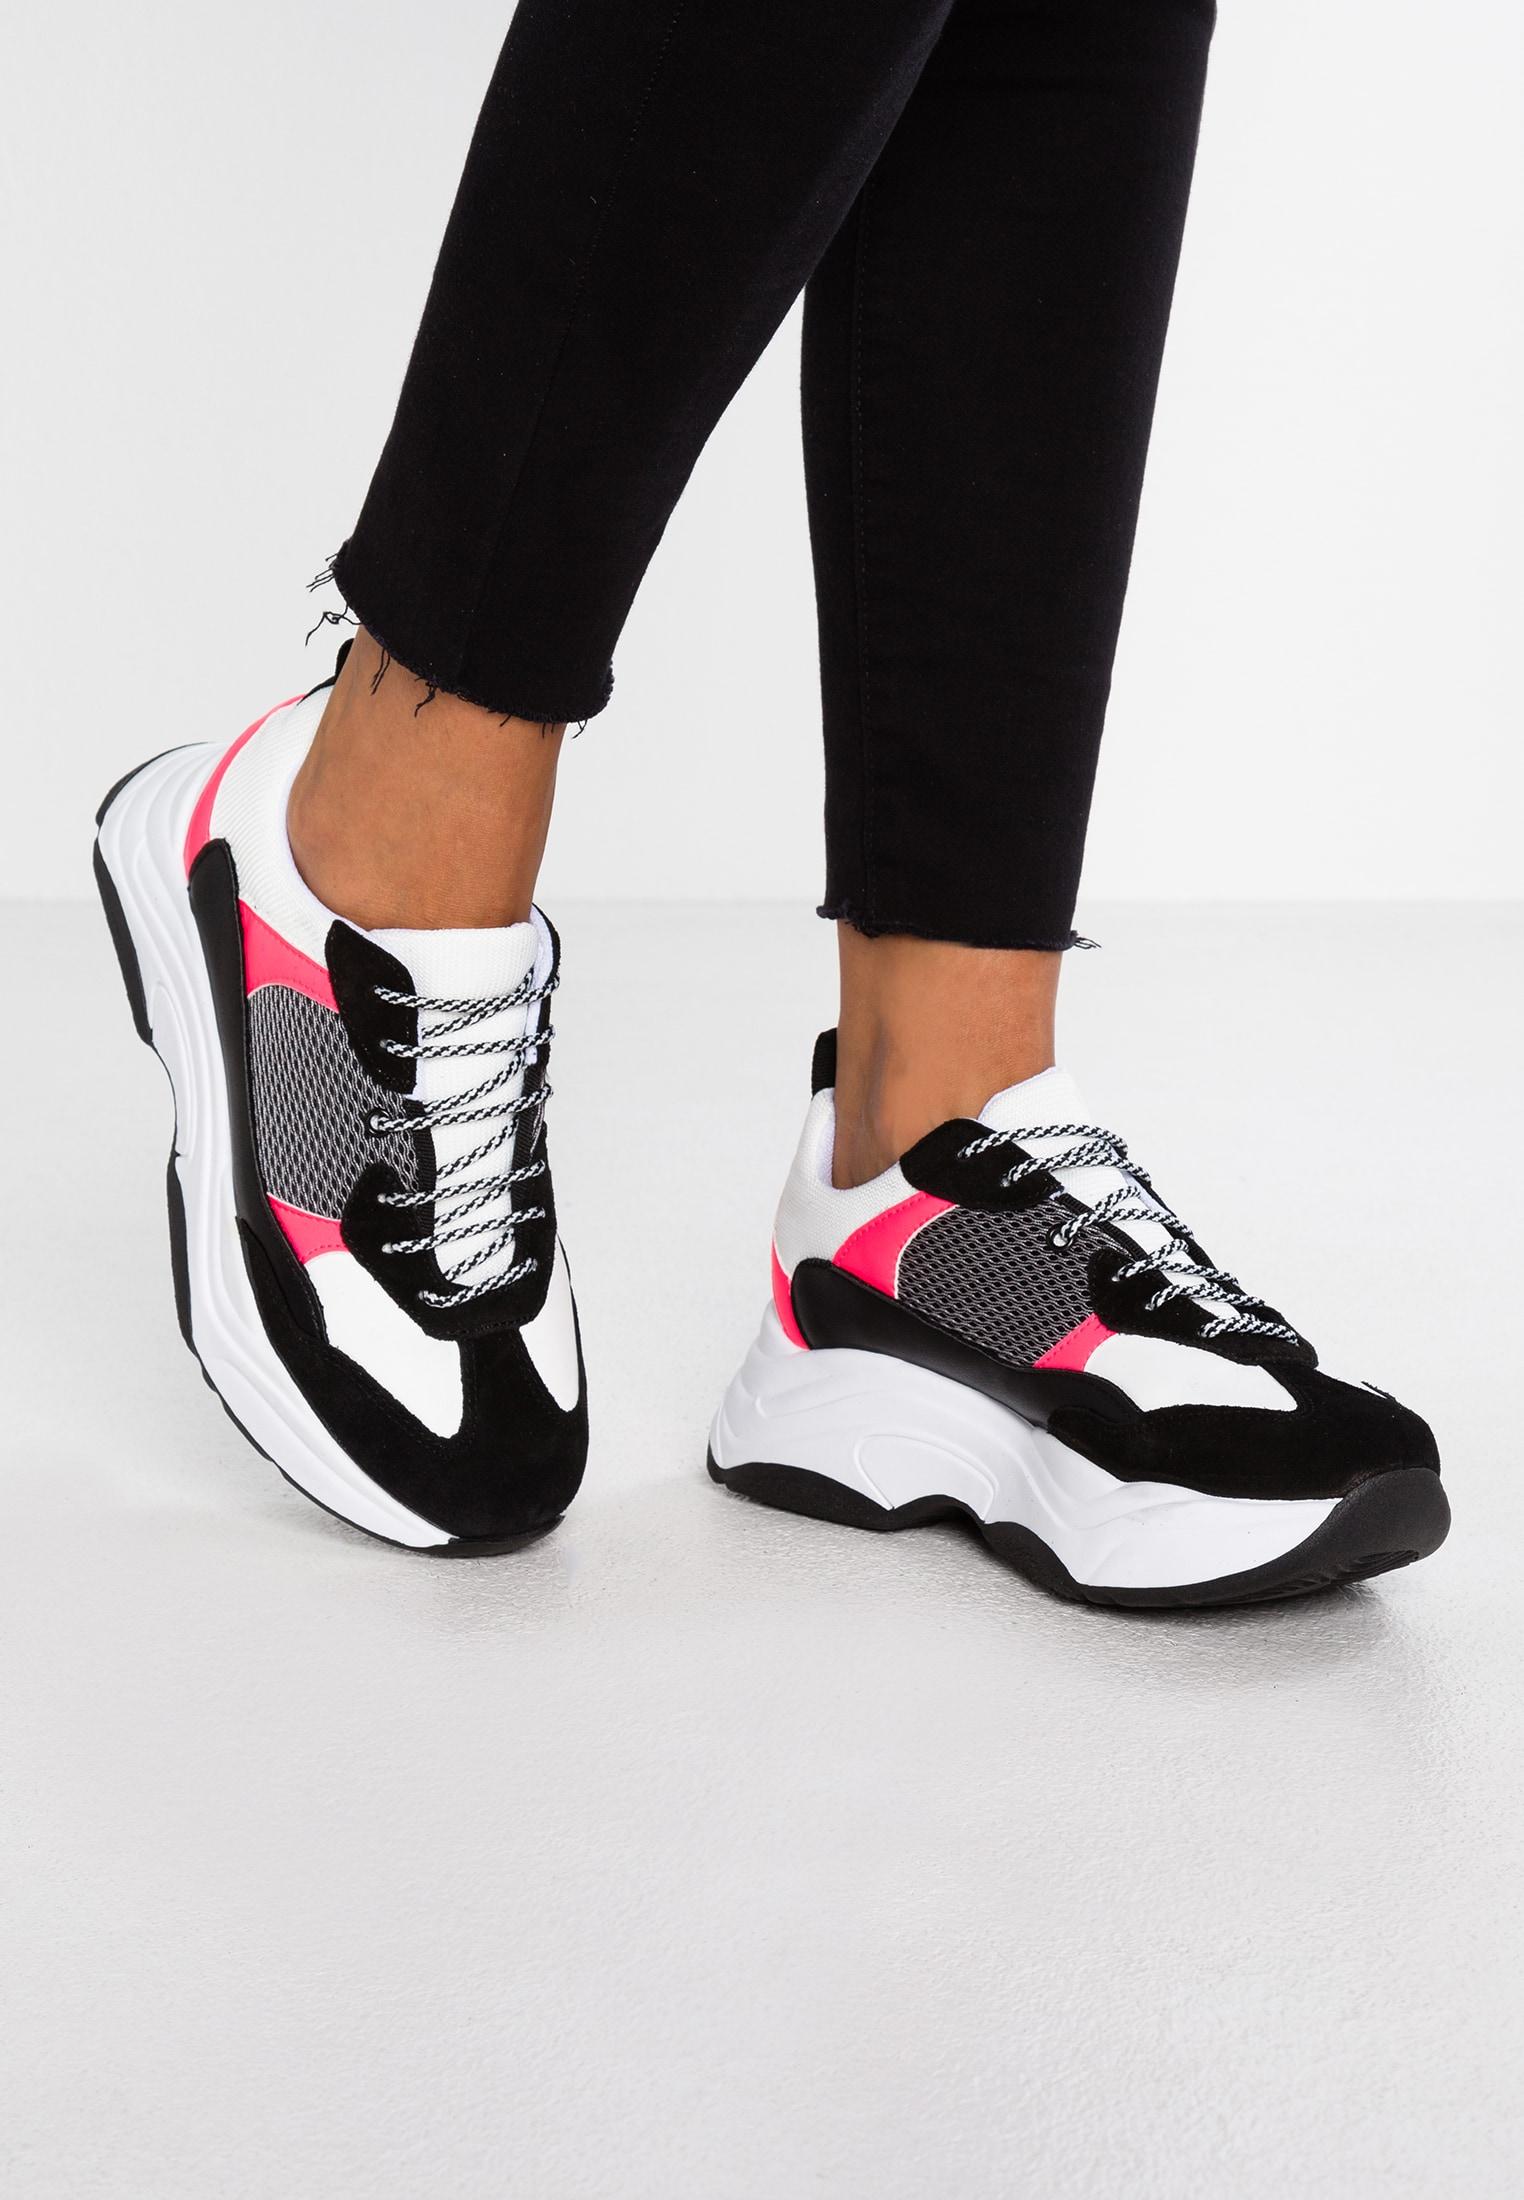 chunky sneakers Ciara topshop